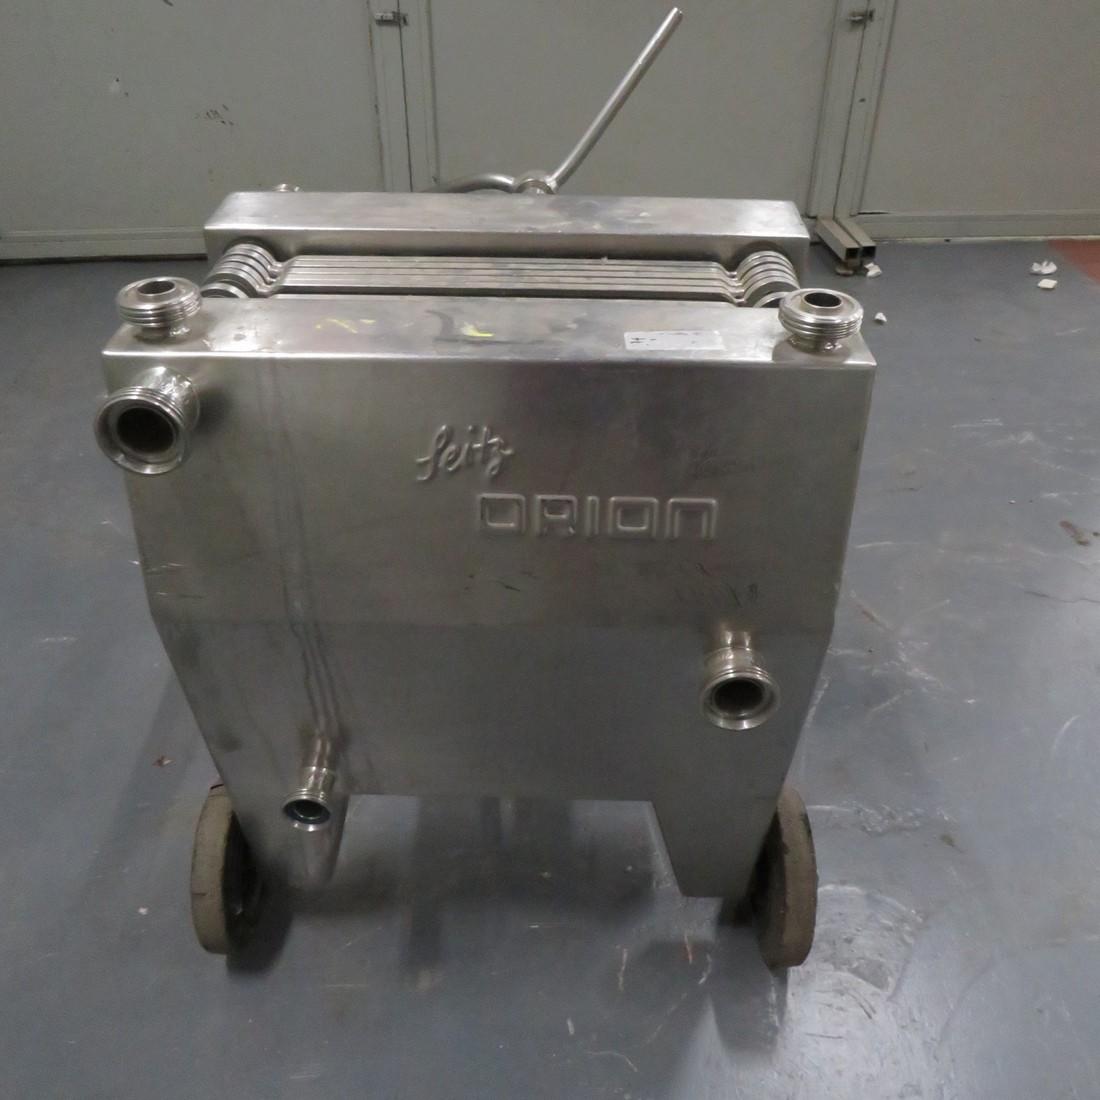 R6FPL51 Stainless steel  SEITZ-WERKE plates filter - 7 plates 400X400mm